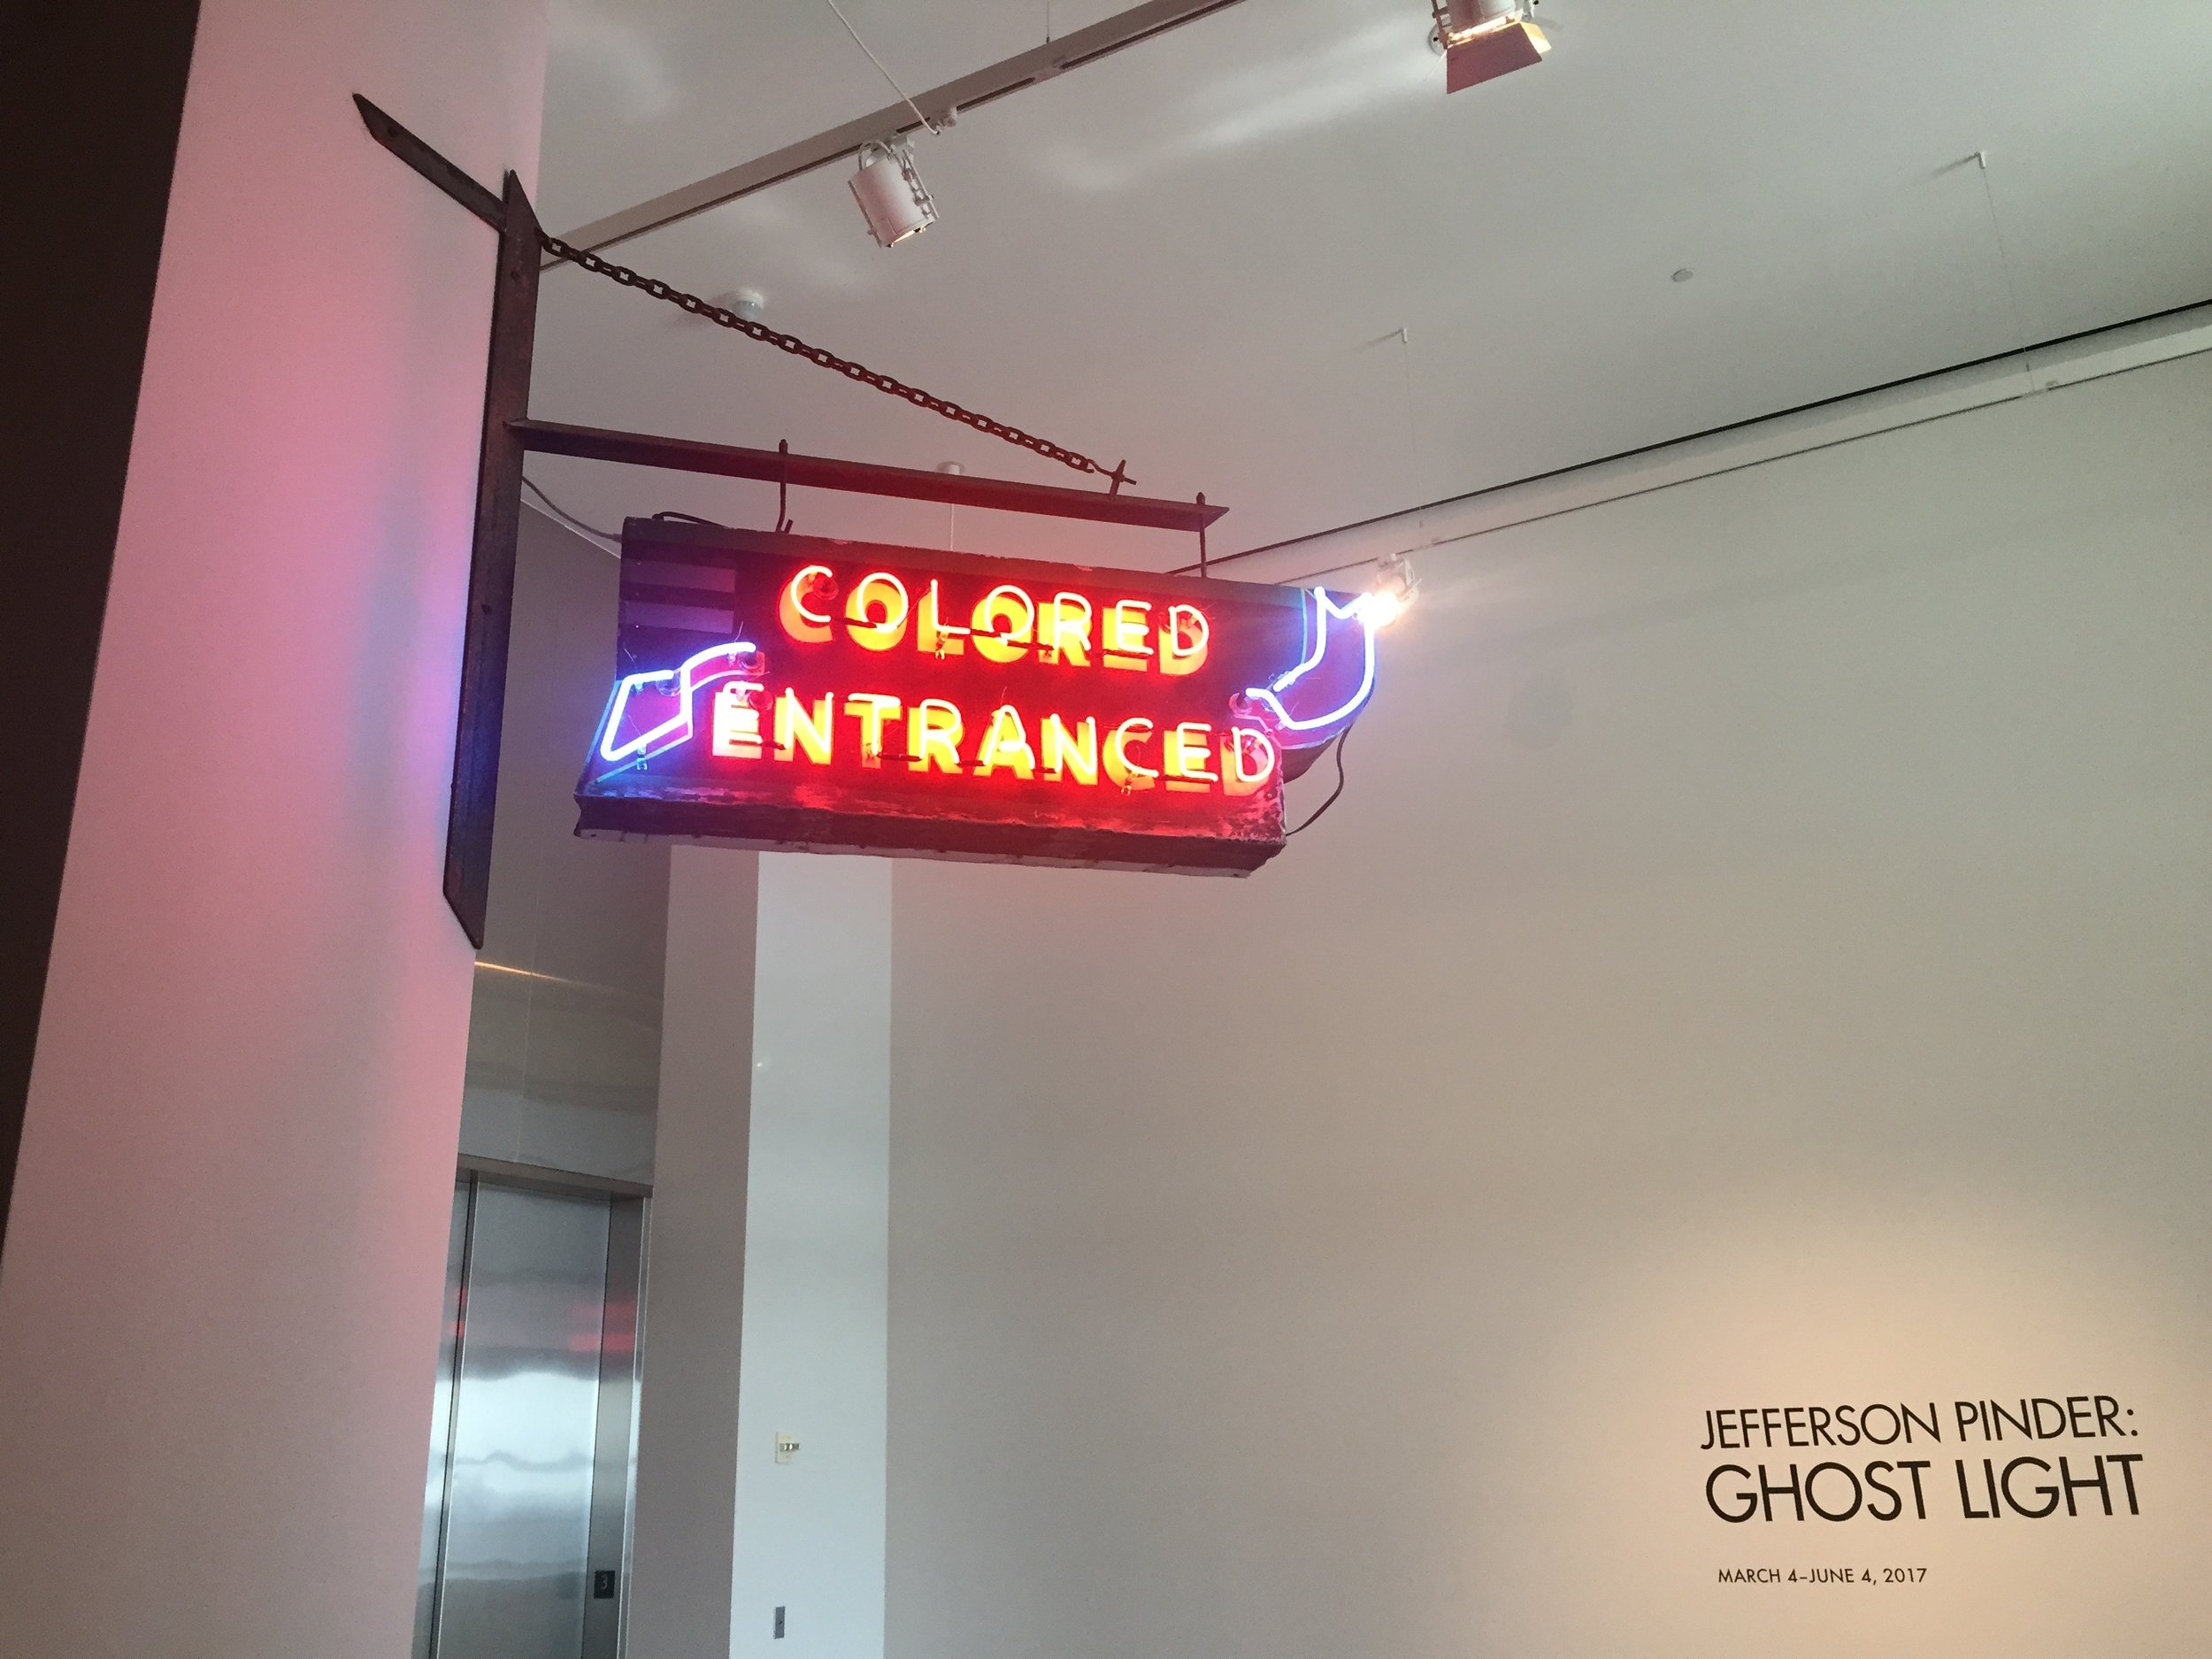 Colored Entranced.jpg